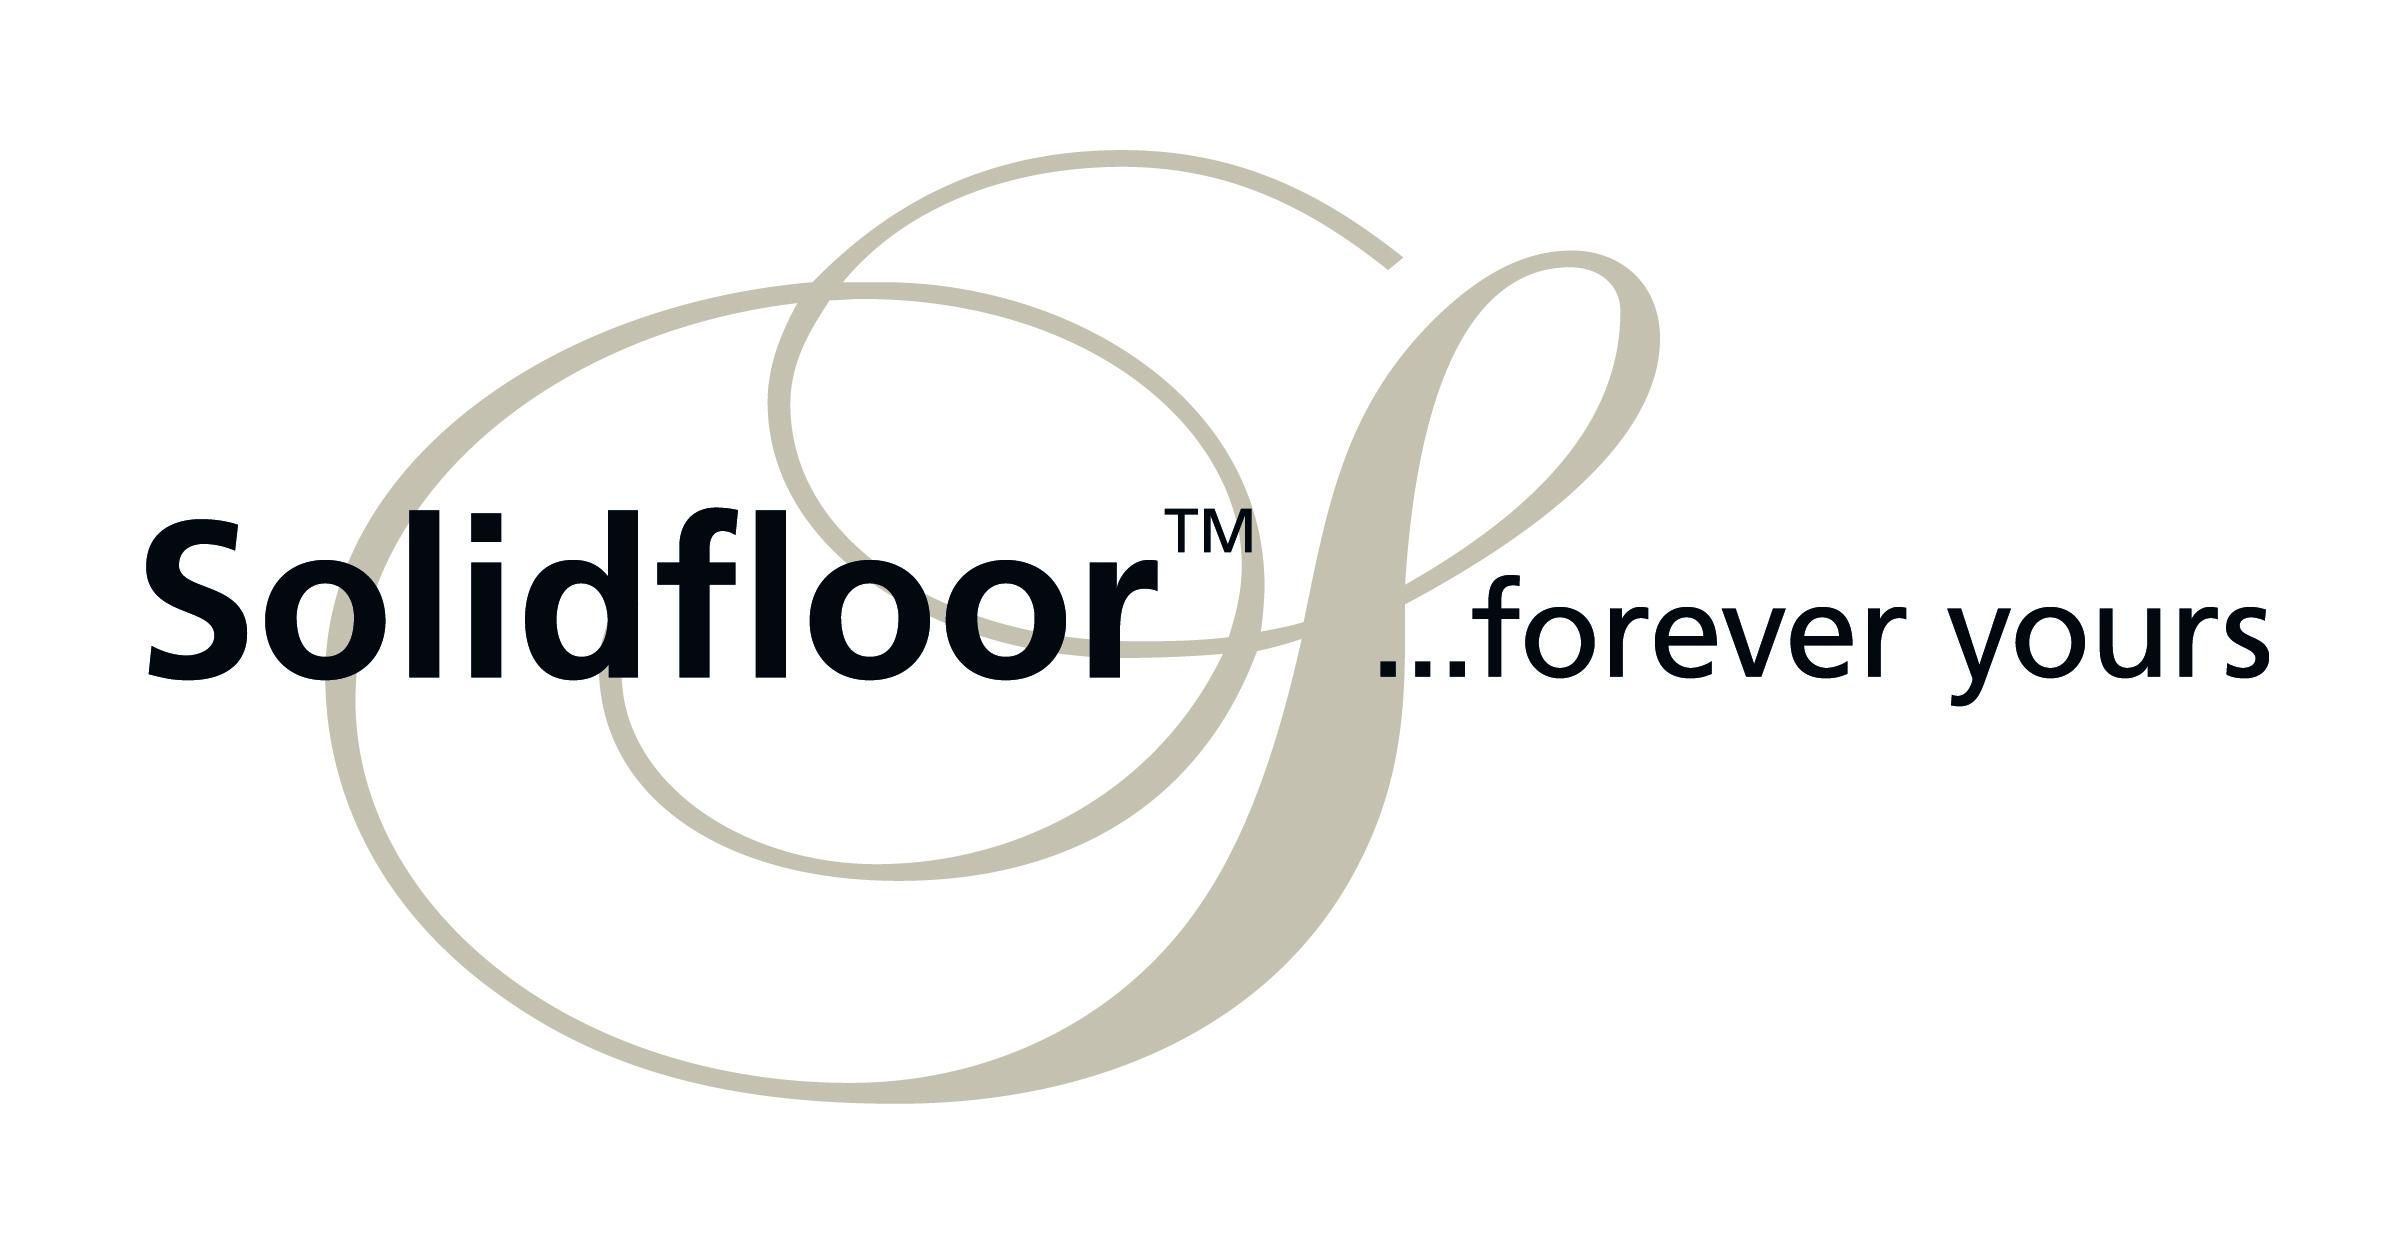 Solidfloor forever yours General 1.jpg